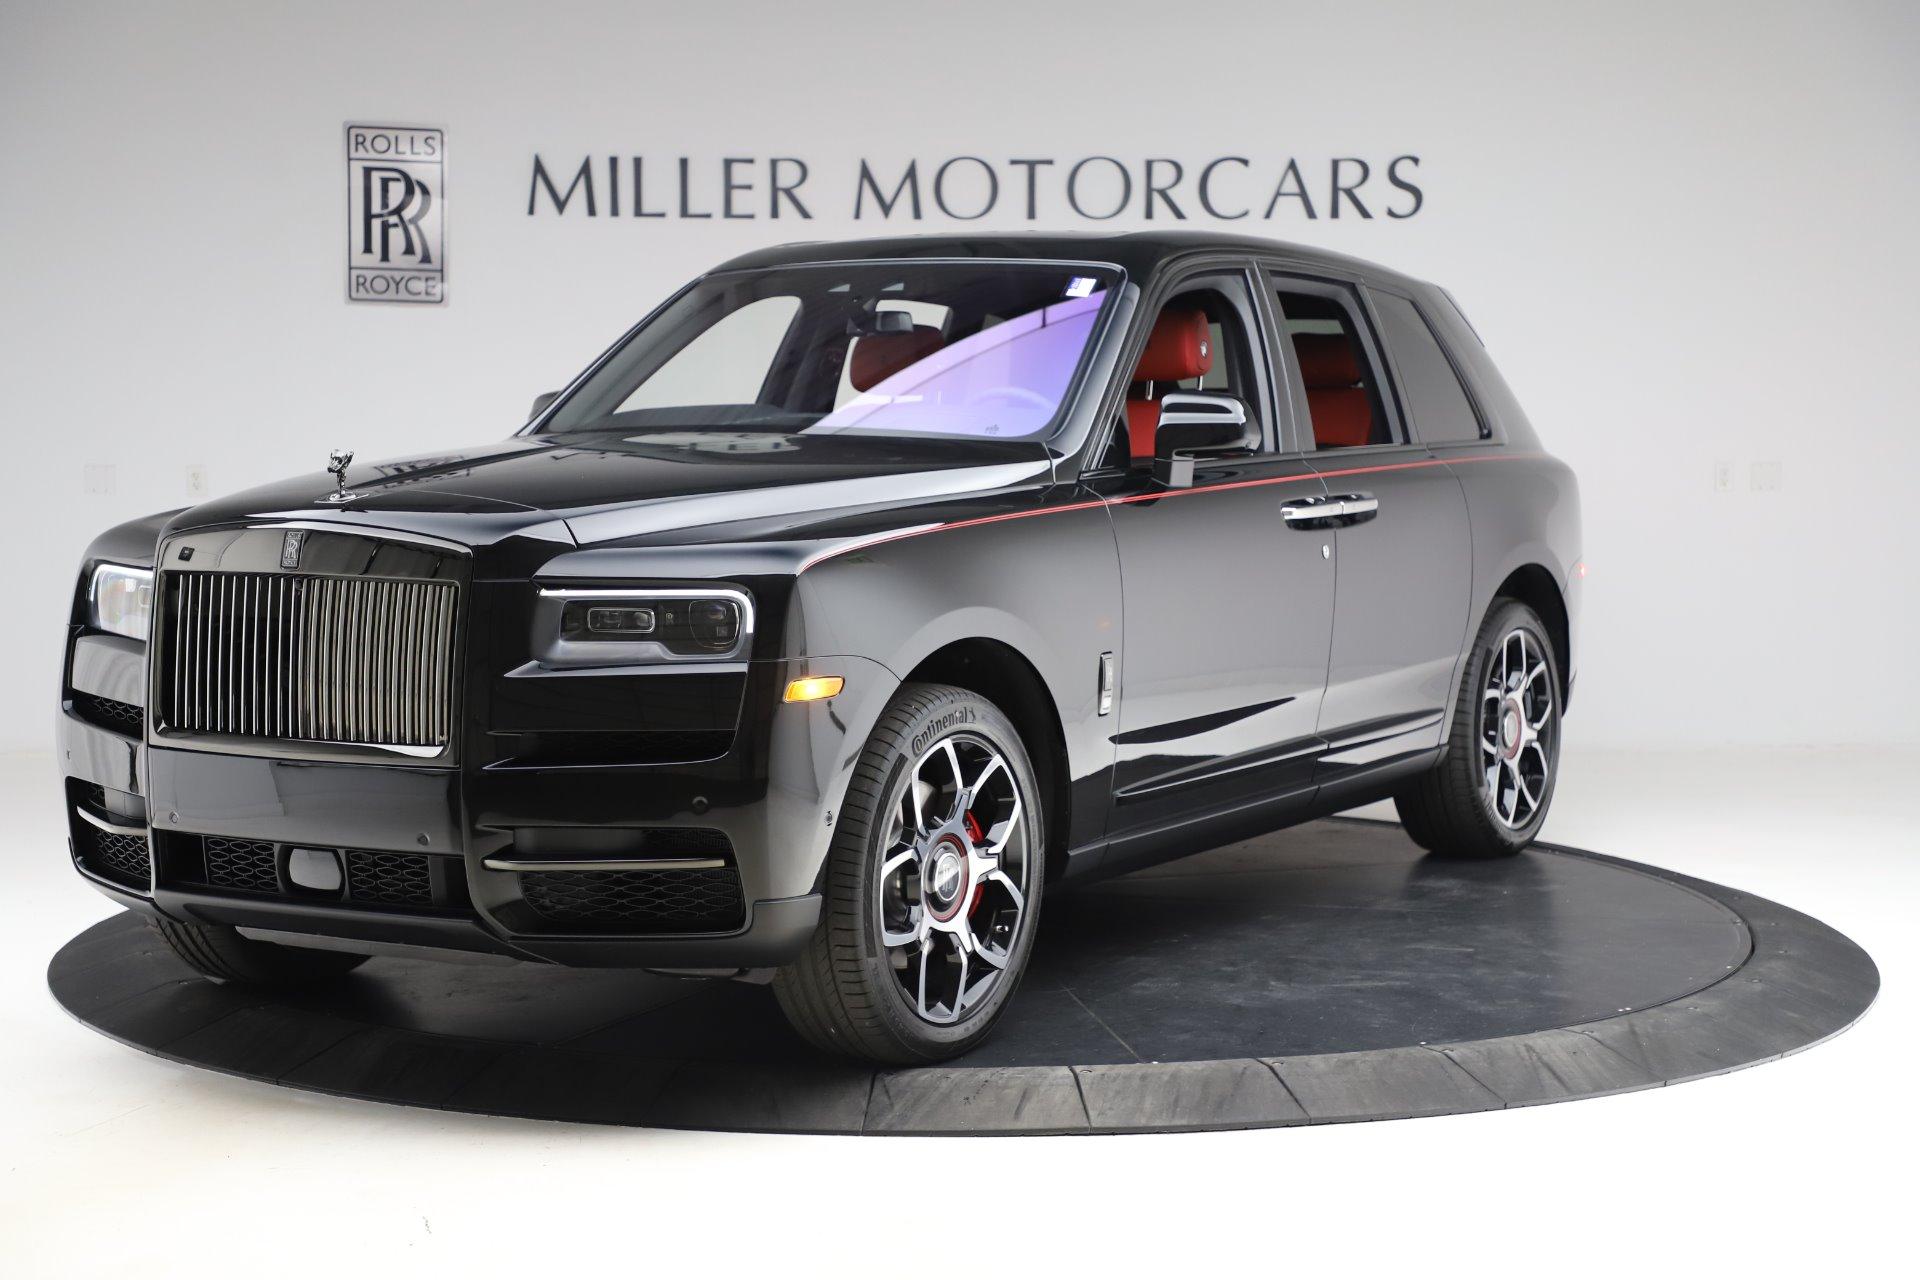 New 2020 Rolls Royce Cullinan Black Badge For Sale Miller Motorcars Stock R562